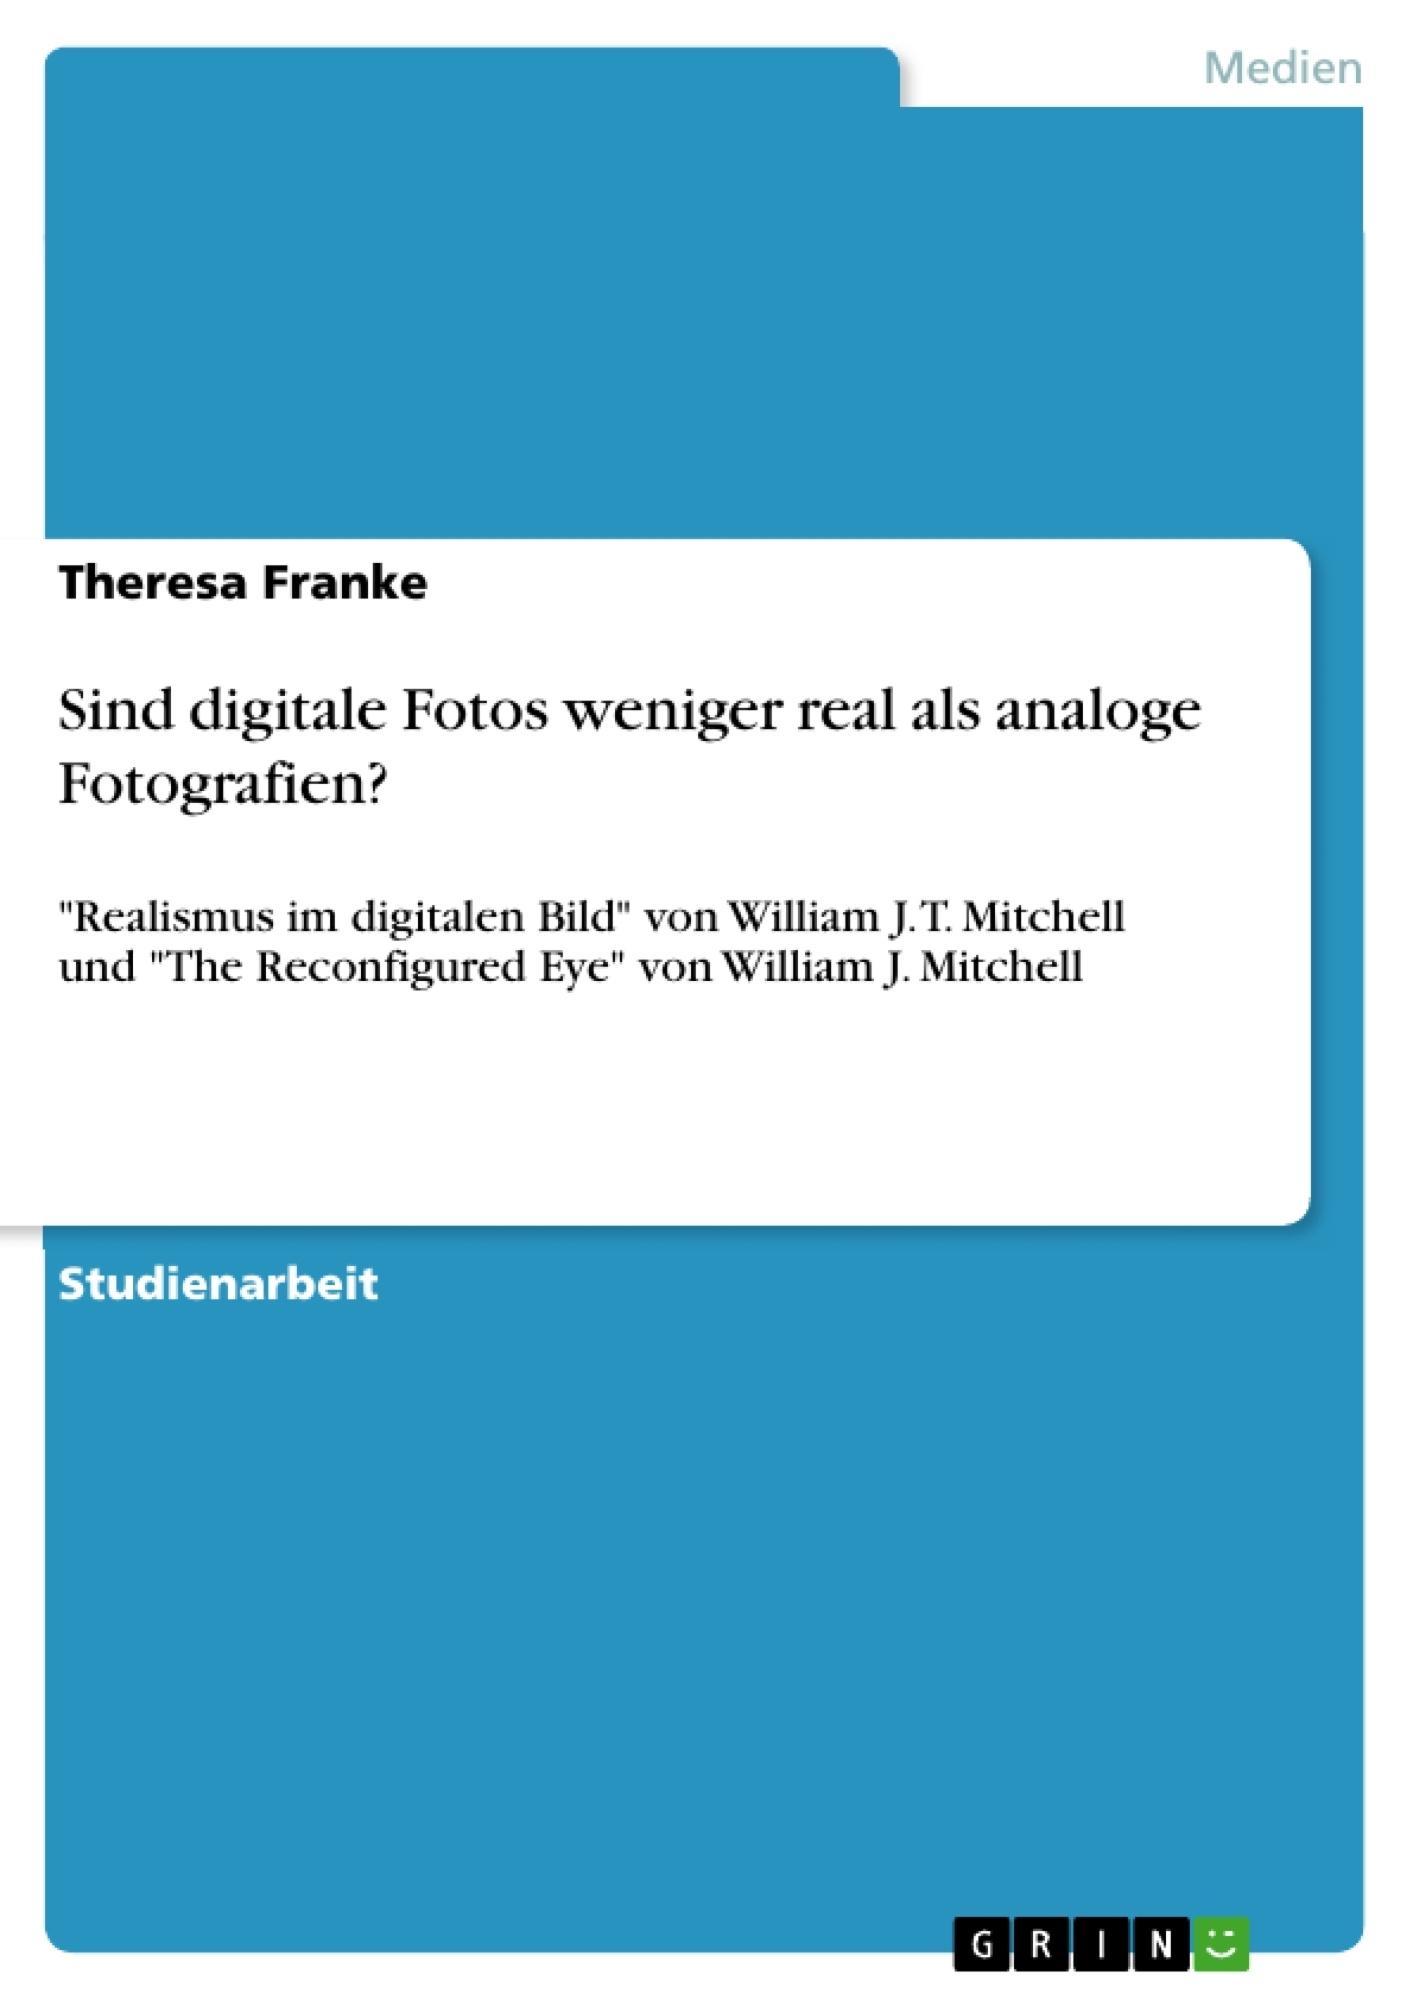 Titel: Sind digitale Fotos weniger real als analoge Fotografien?